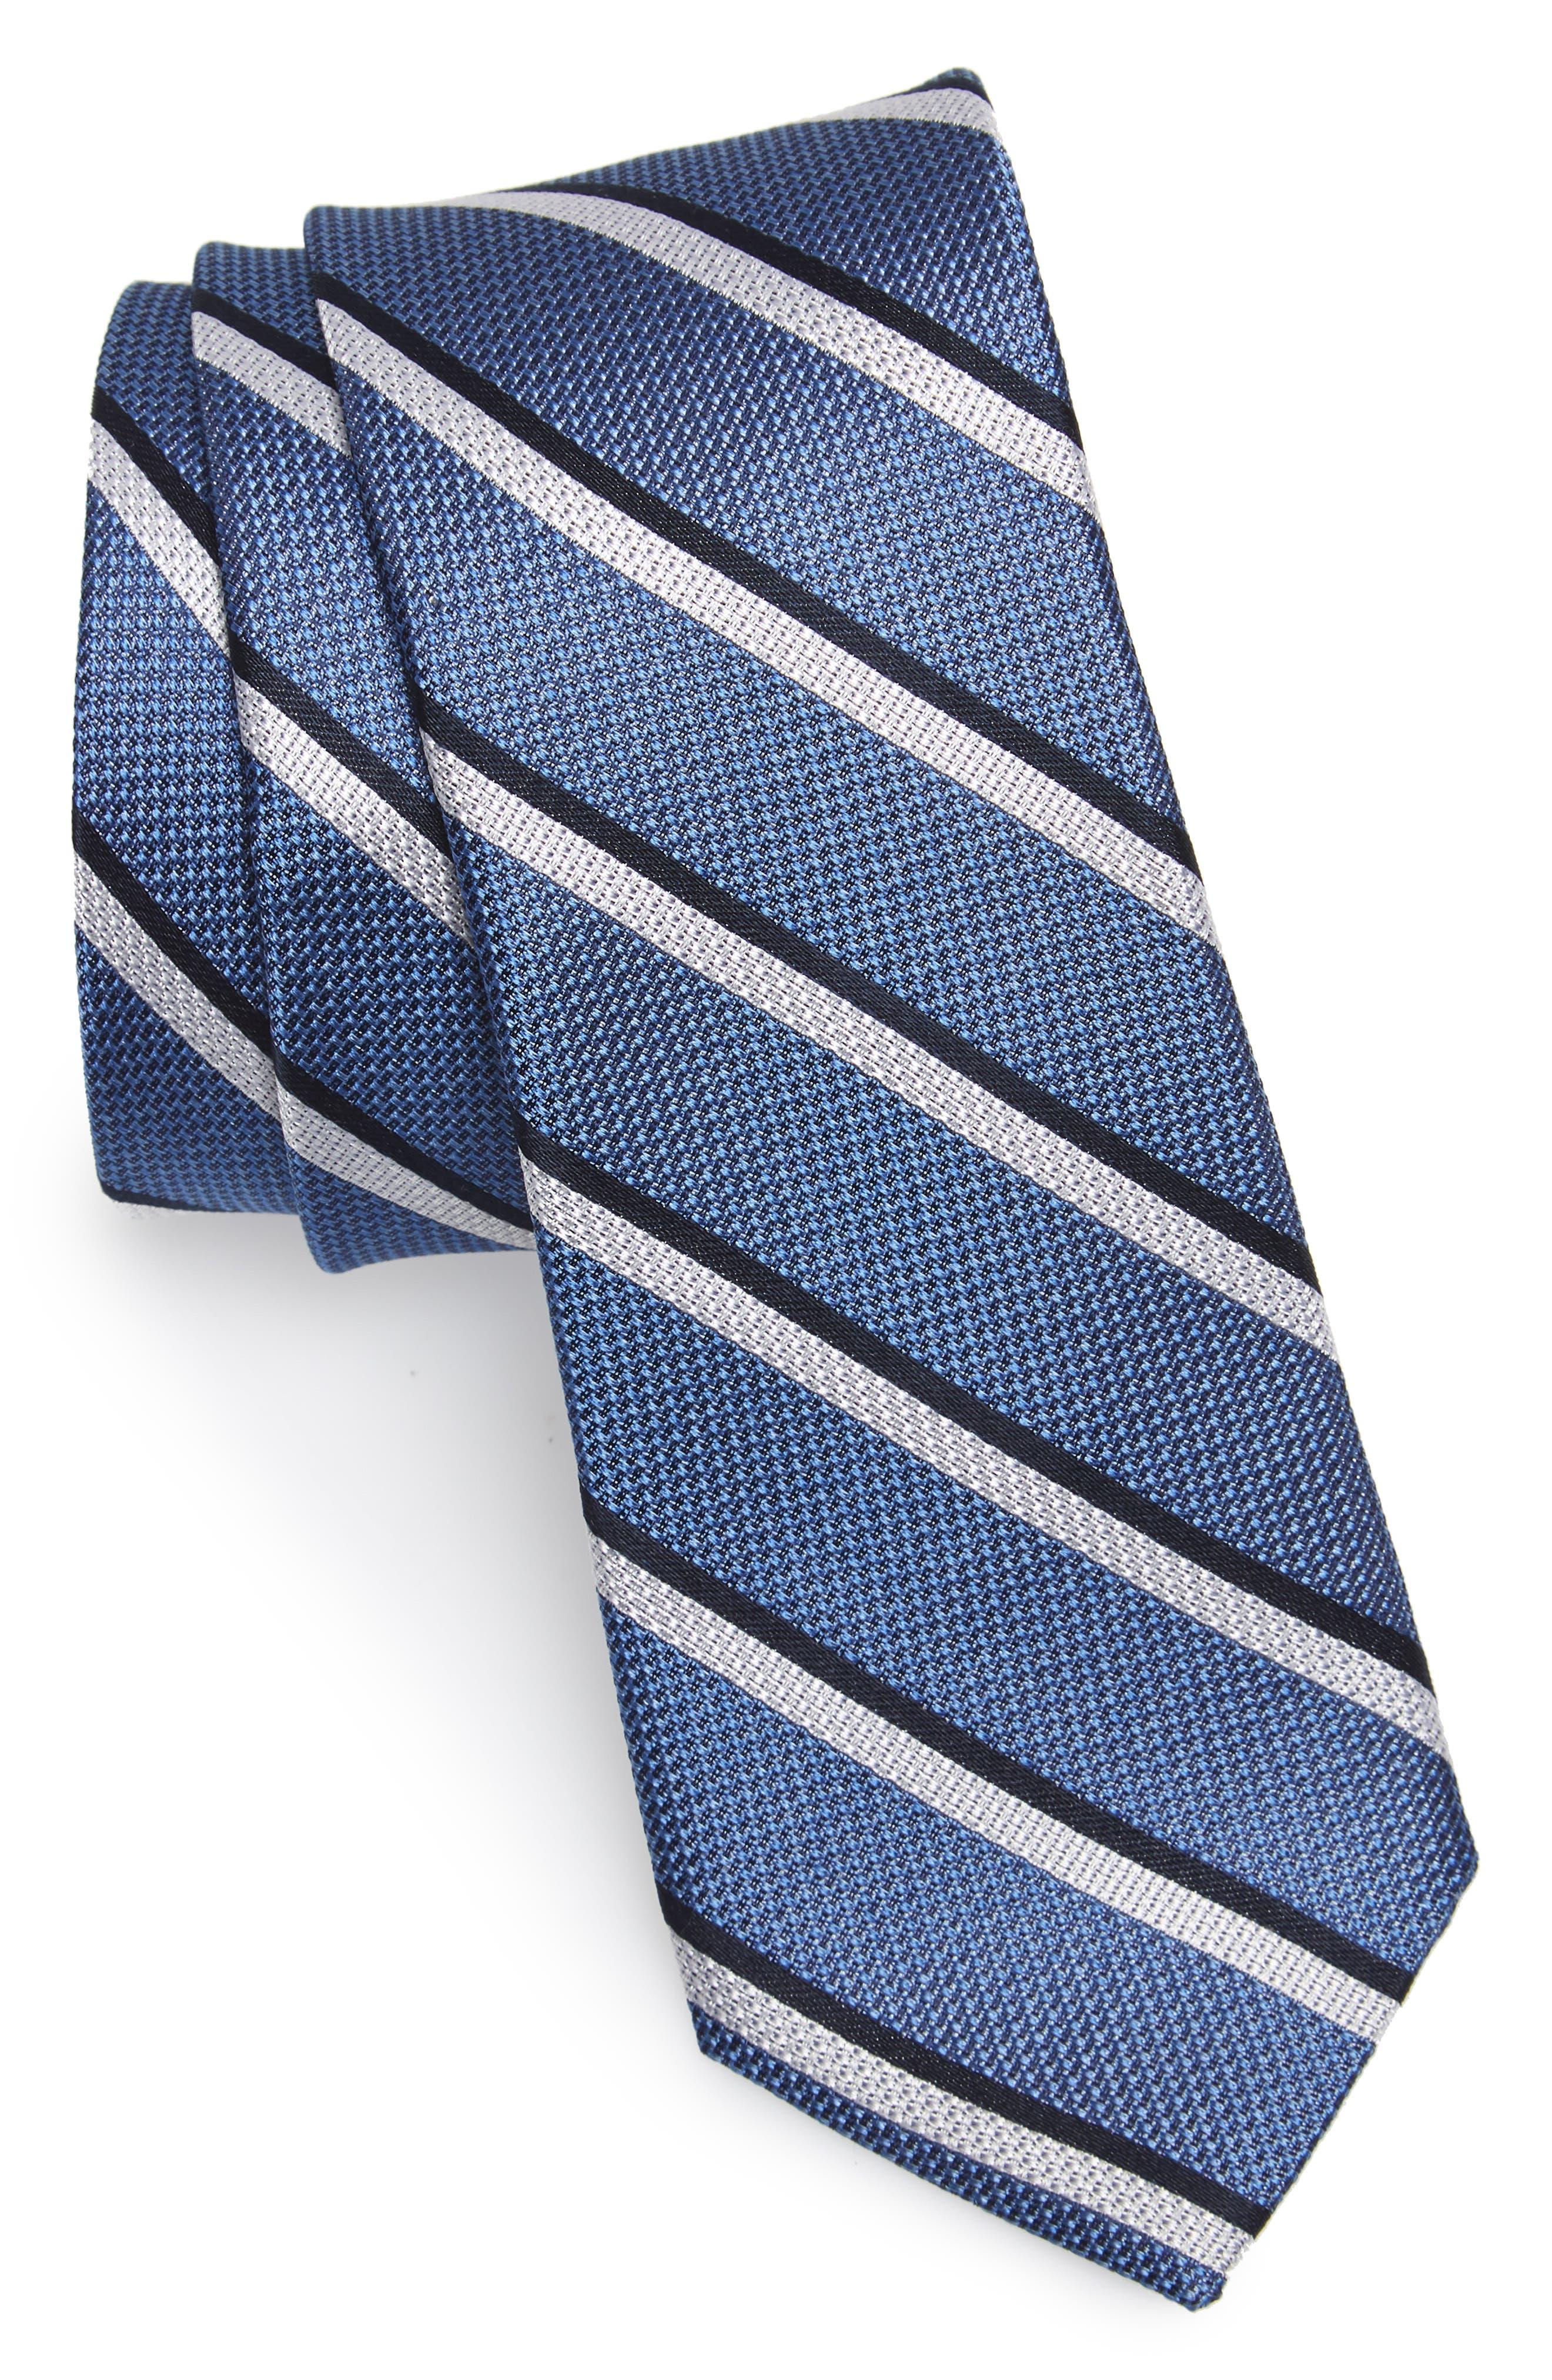 Koehler Stripe Silk Skinny Tie,                             Main thumbnail 1, color,                             400